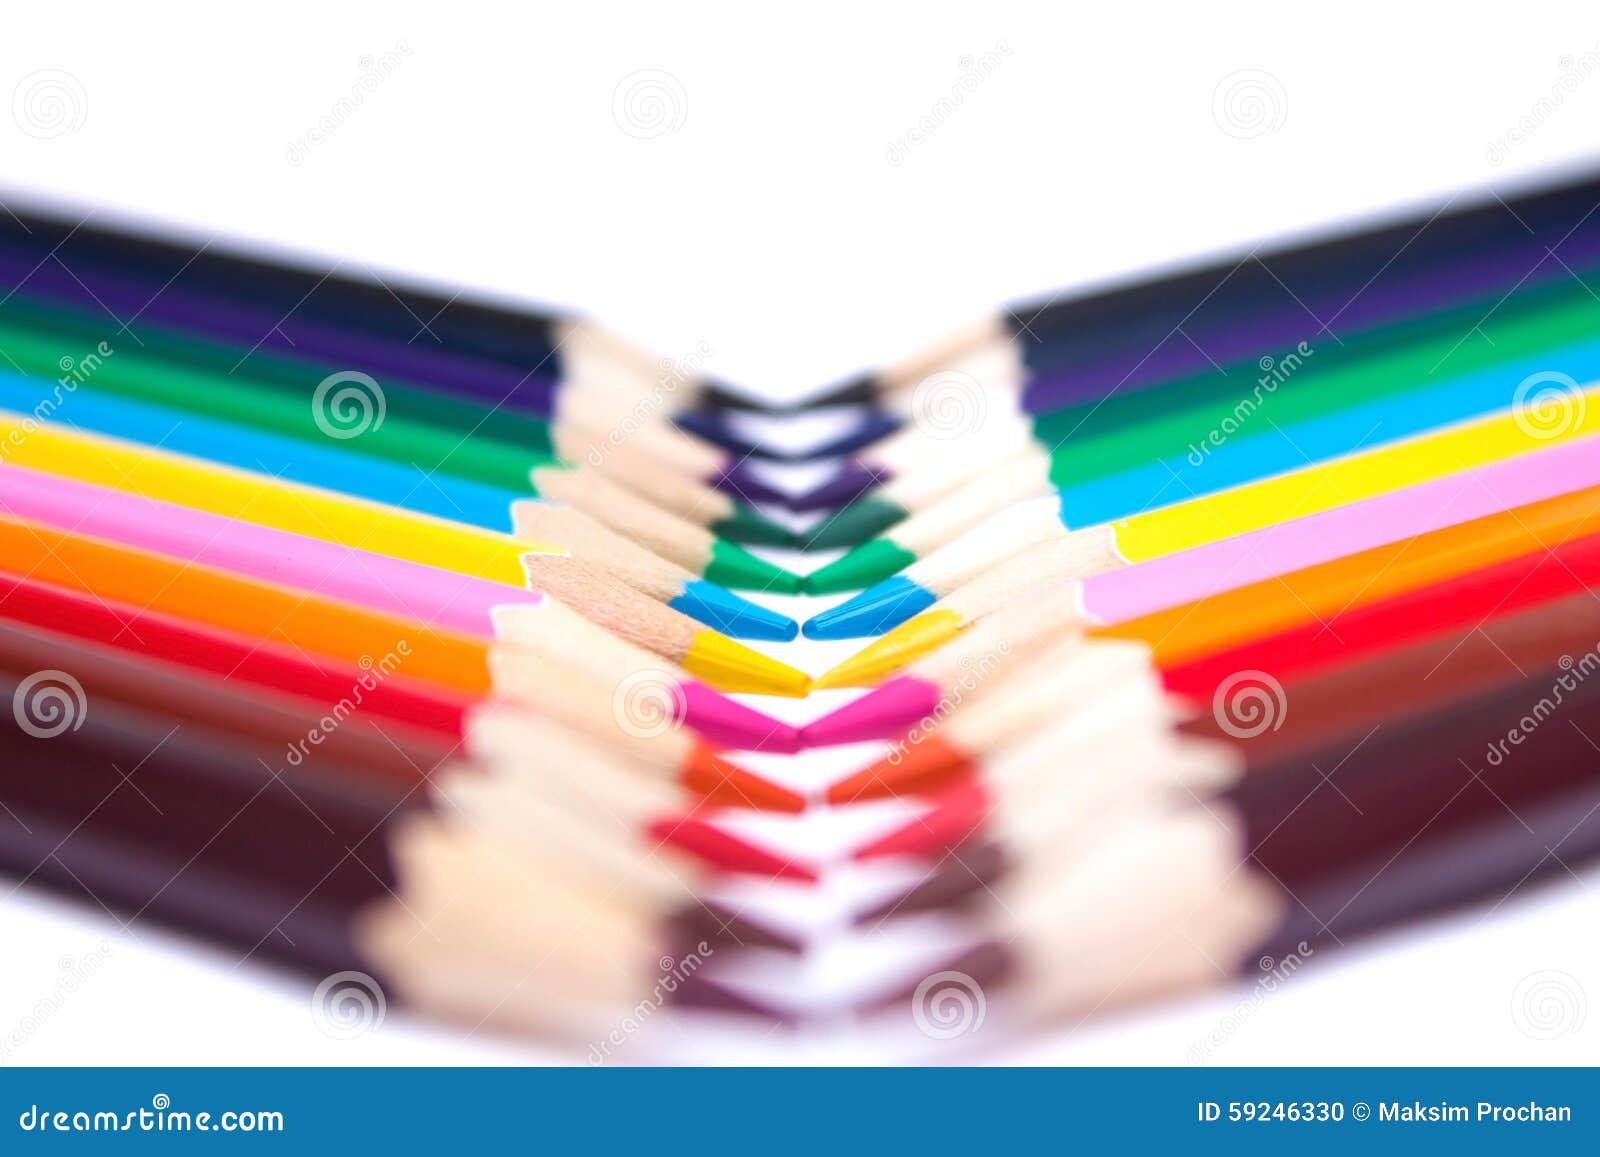 Lápices coloreados en un fondo aislado